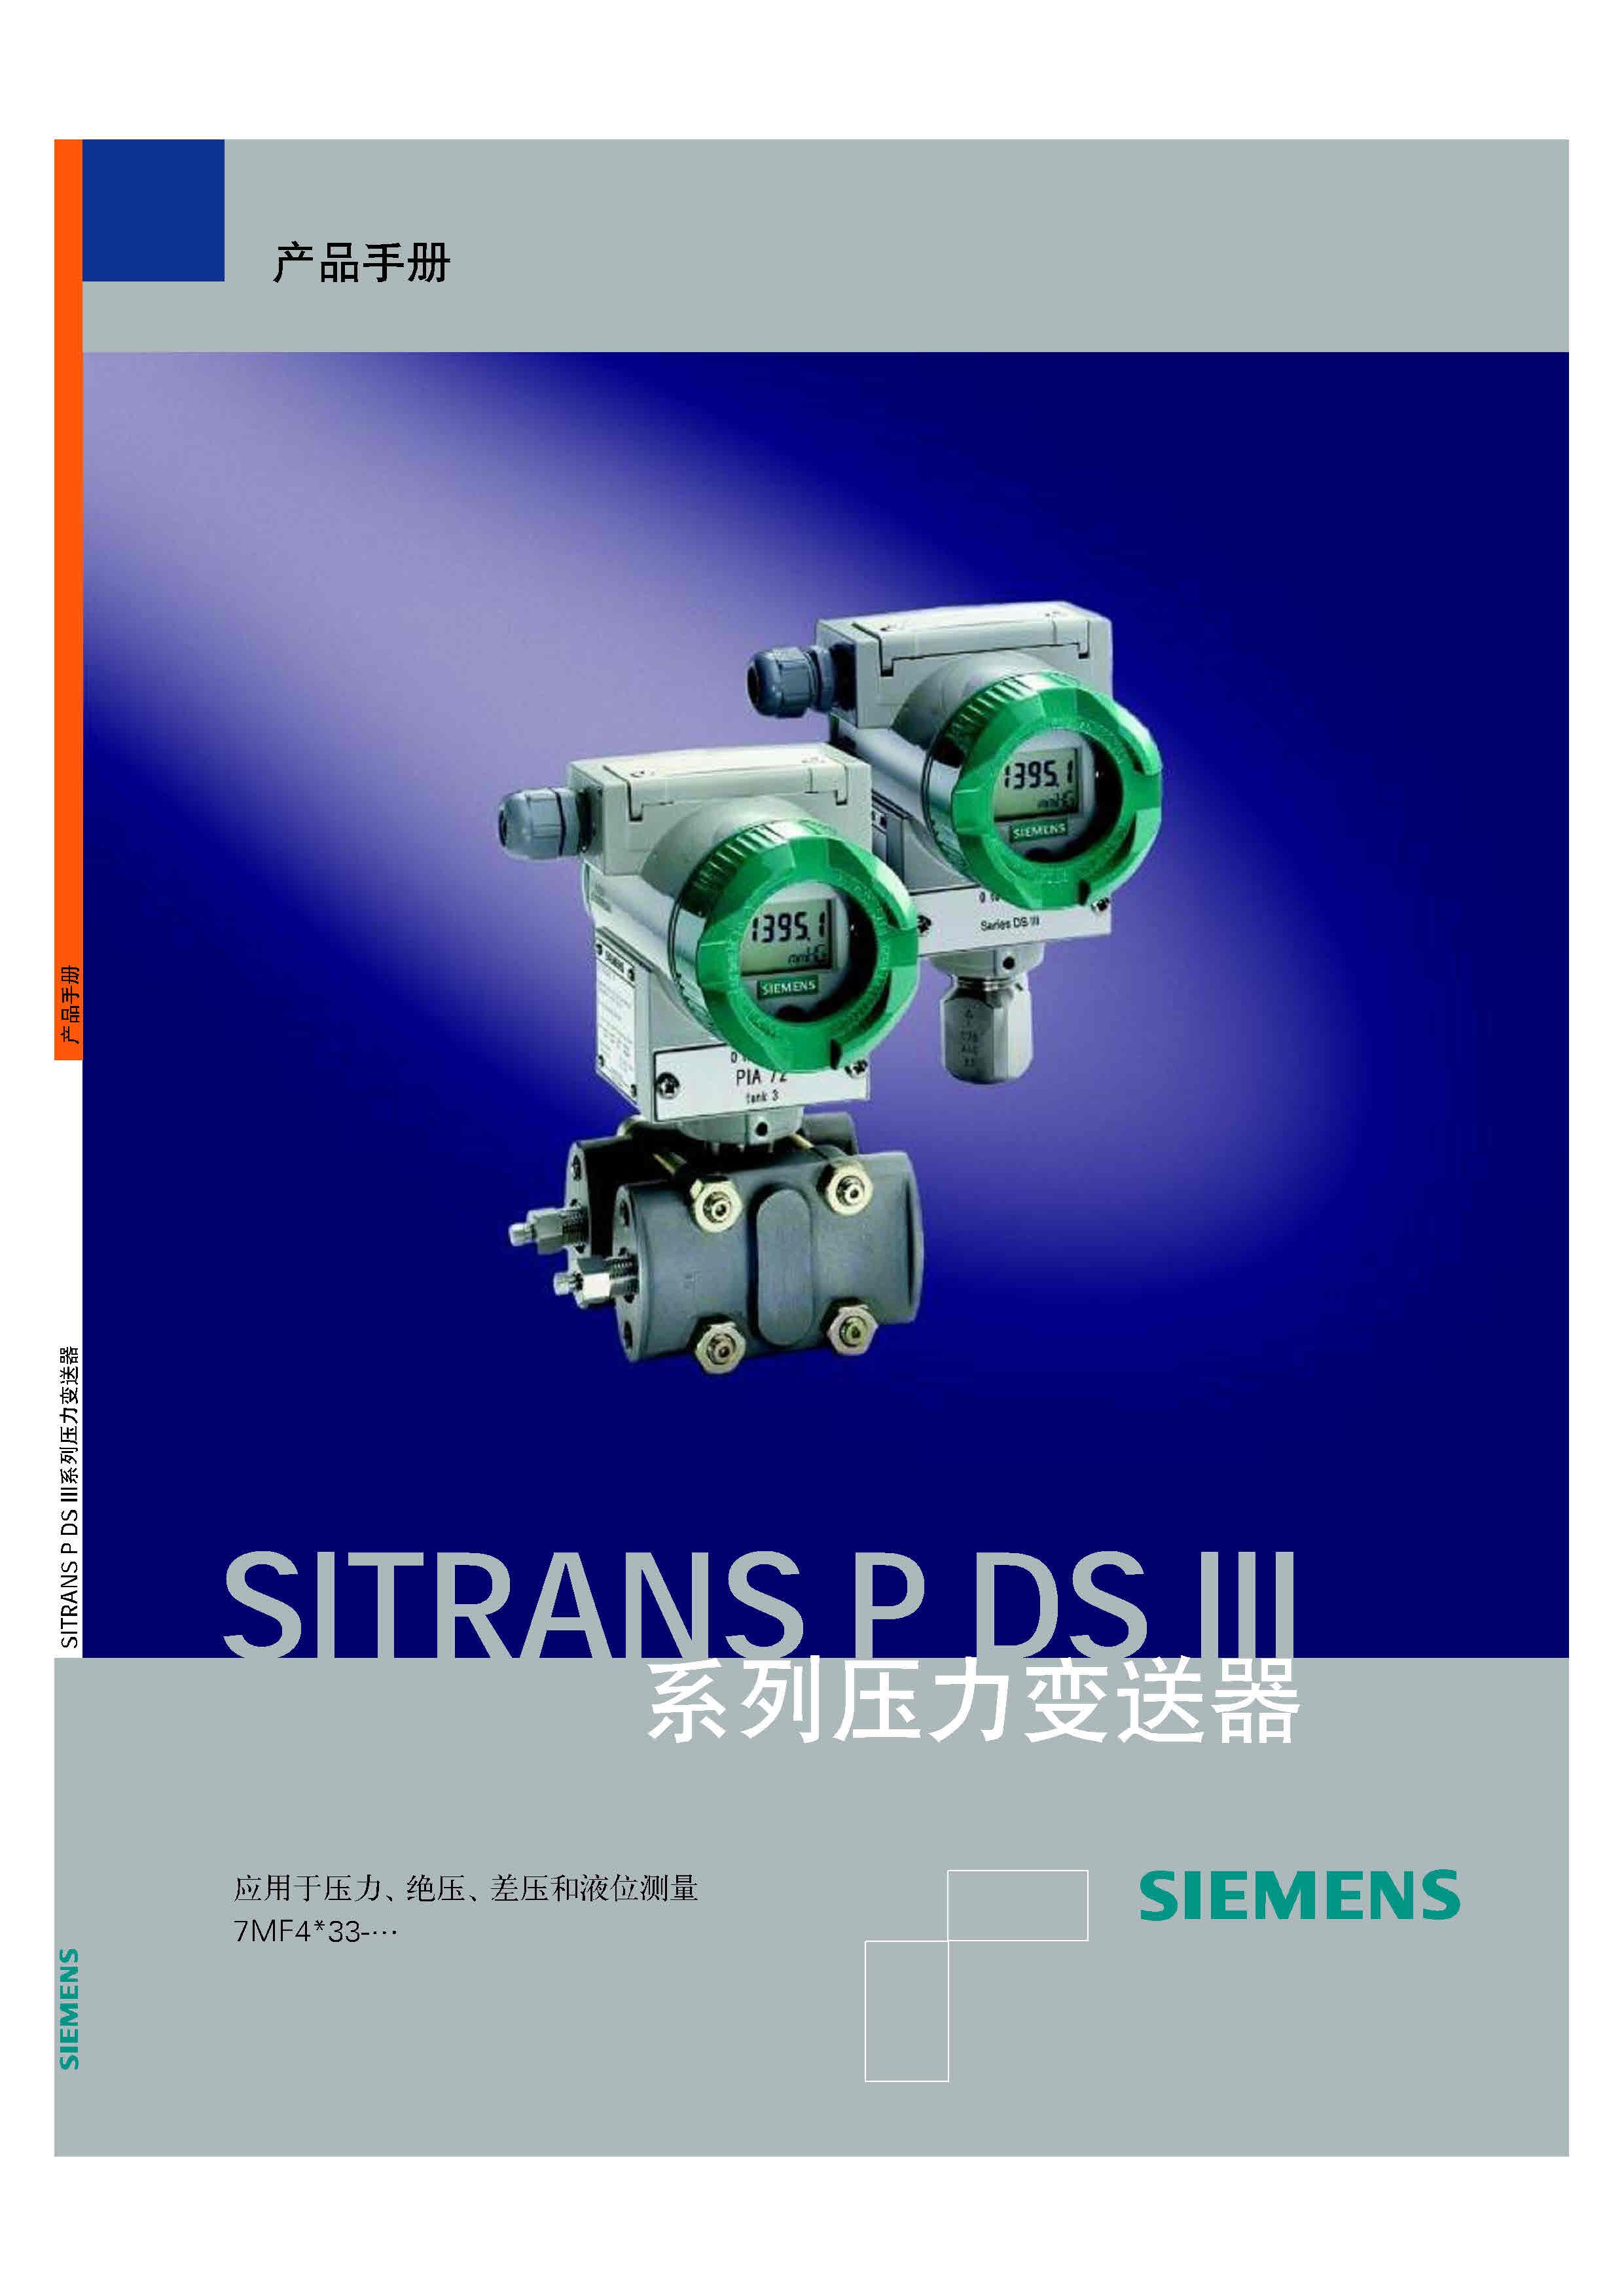 SITRANS-P-DS-III智能型压力变送器